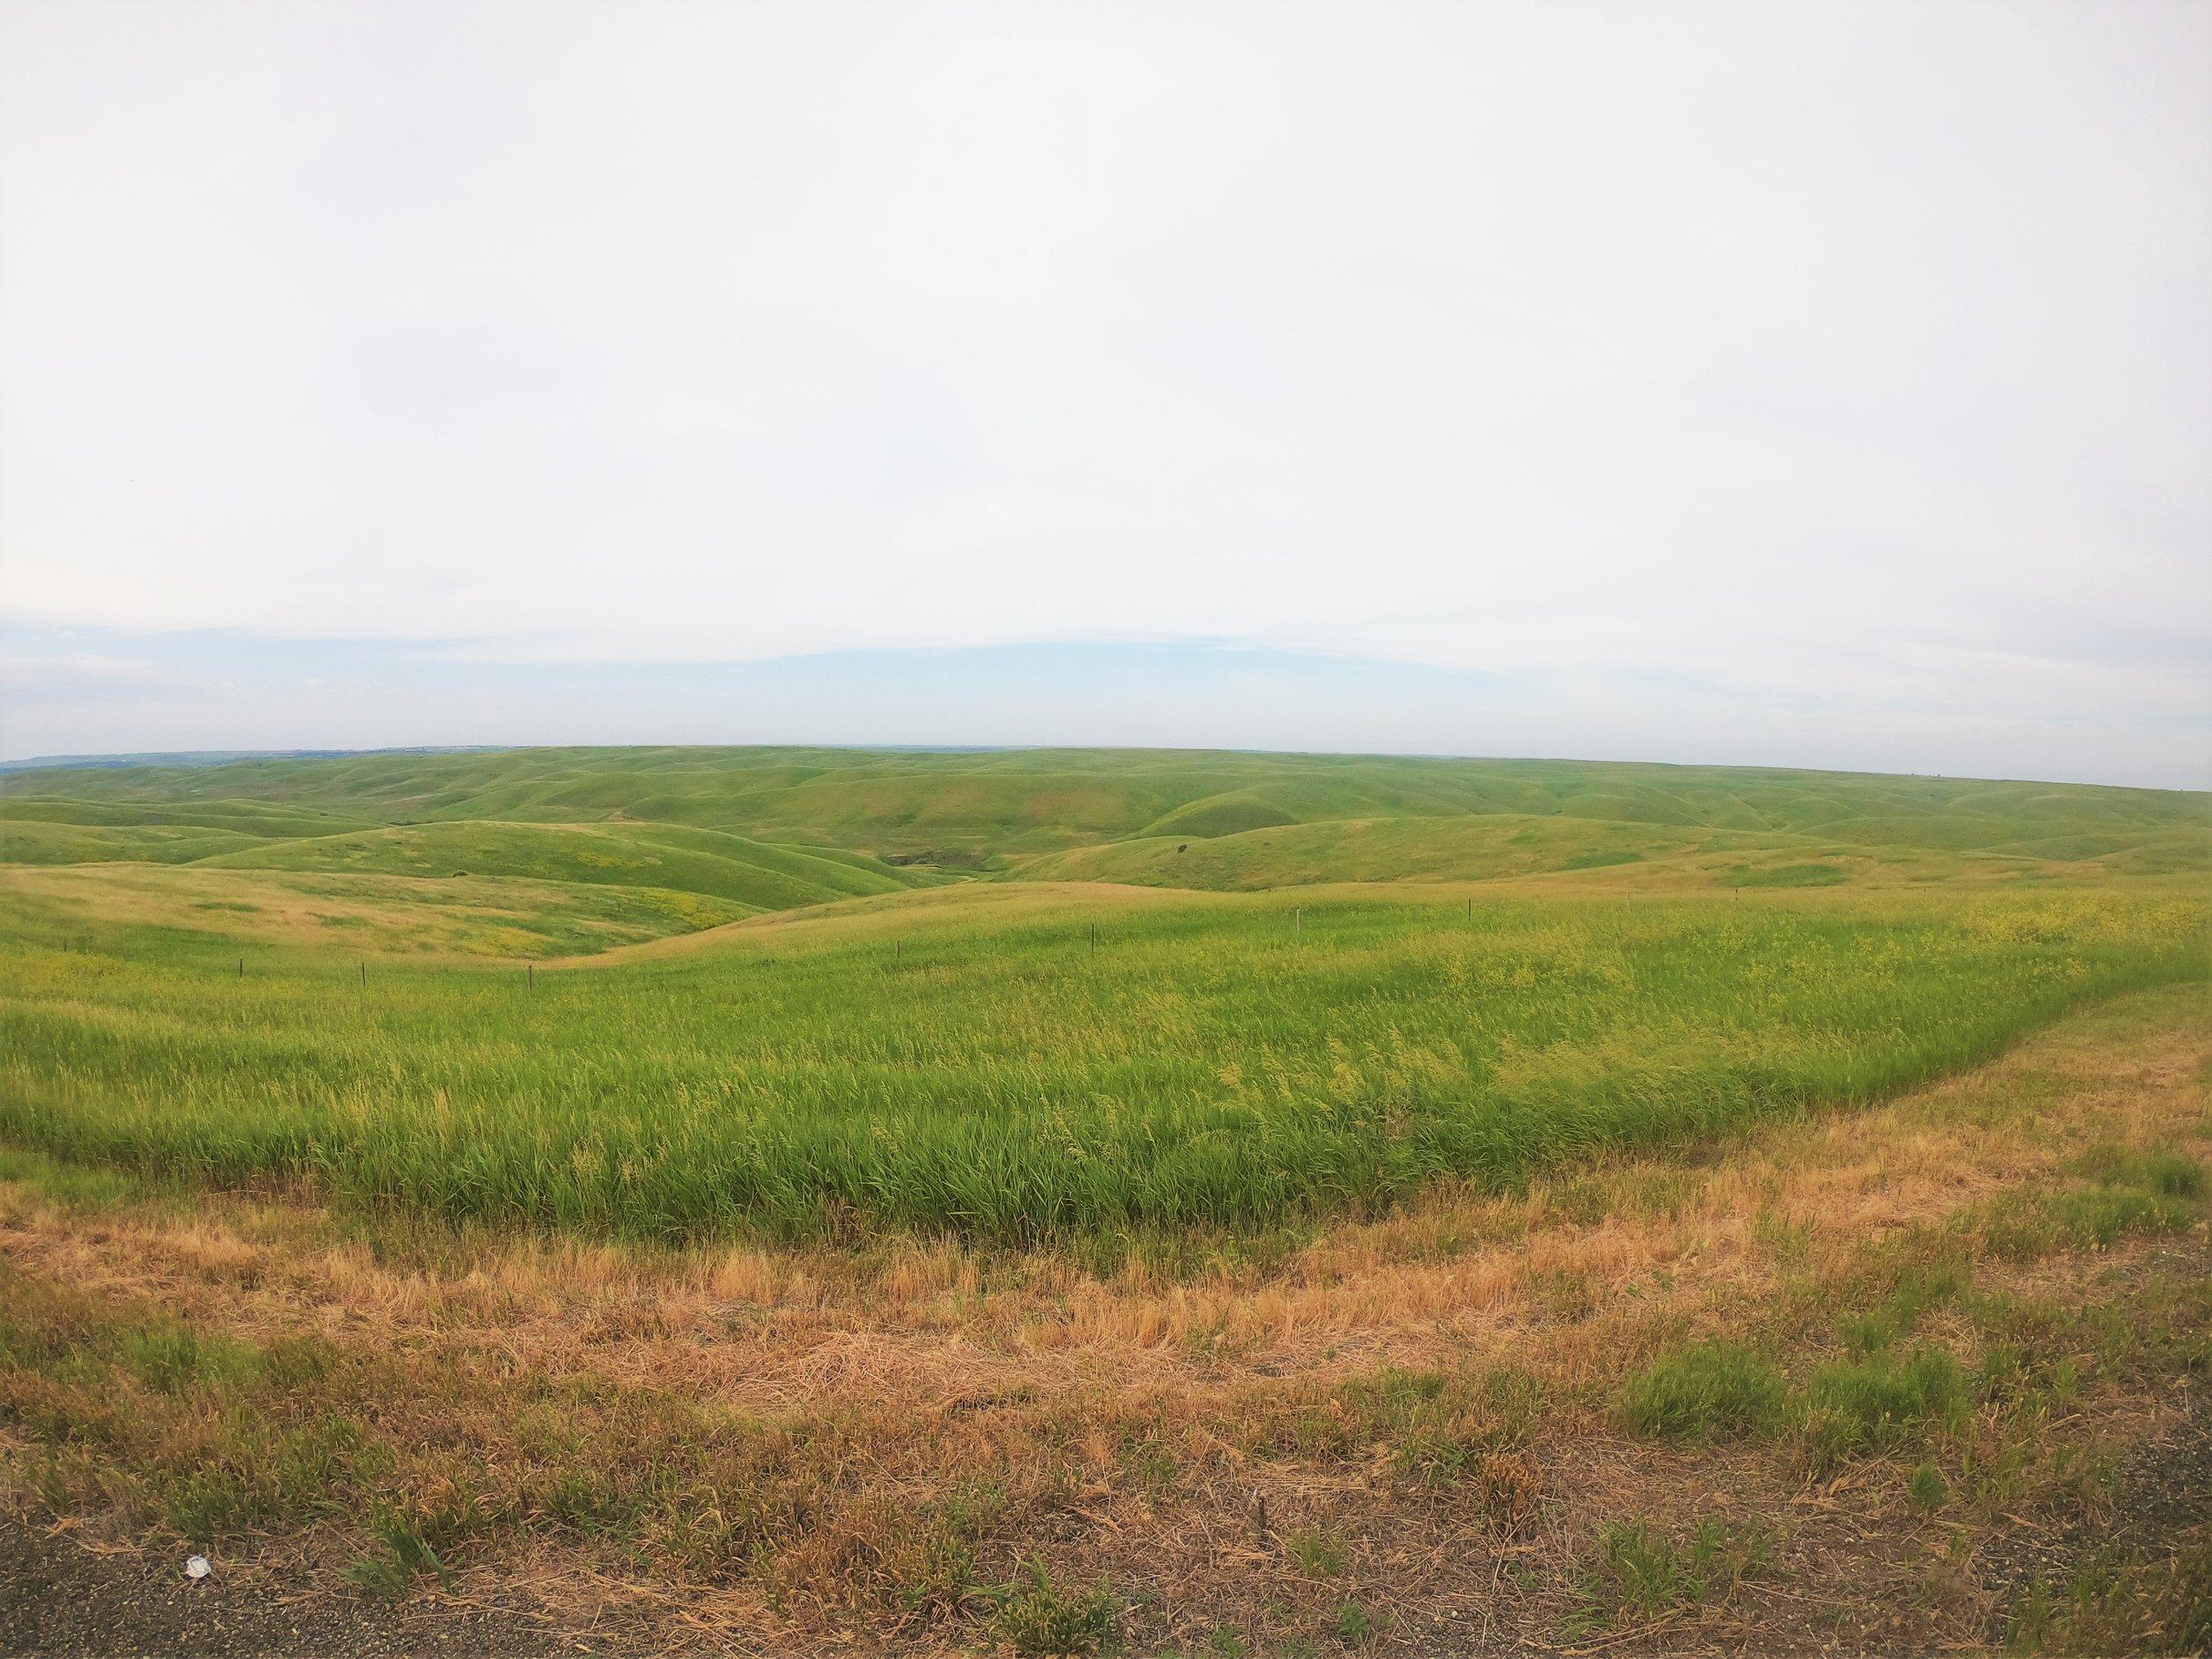 South Dakota grasslands